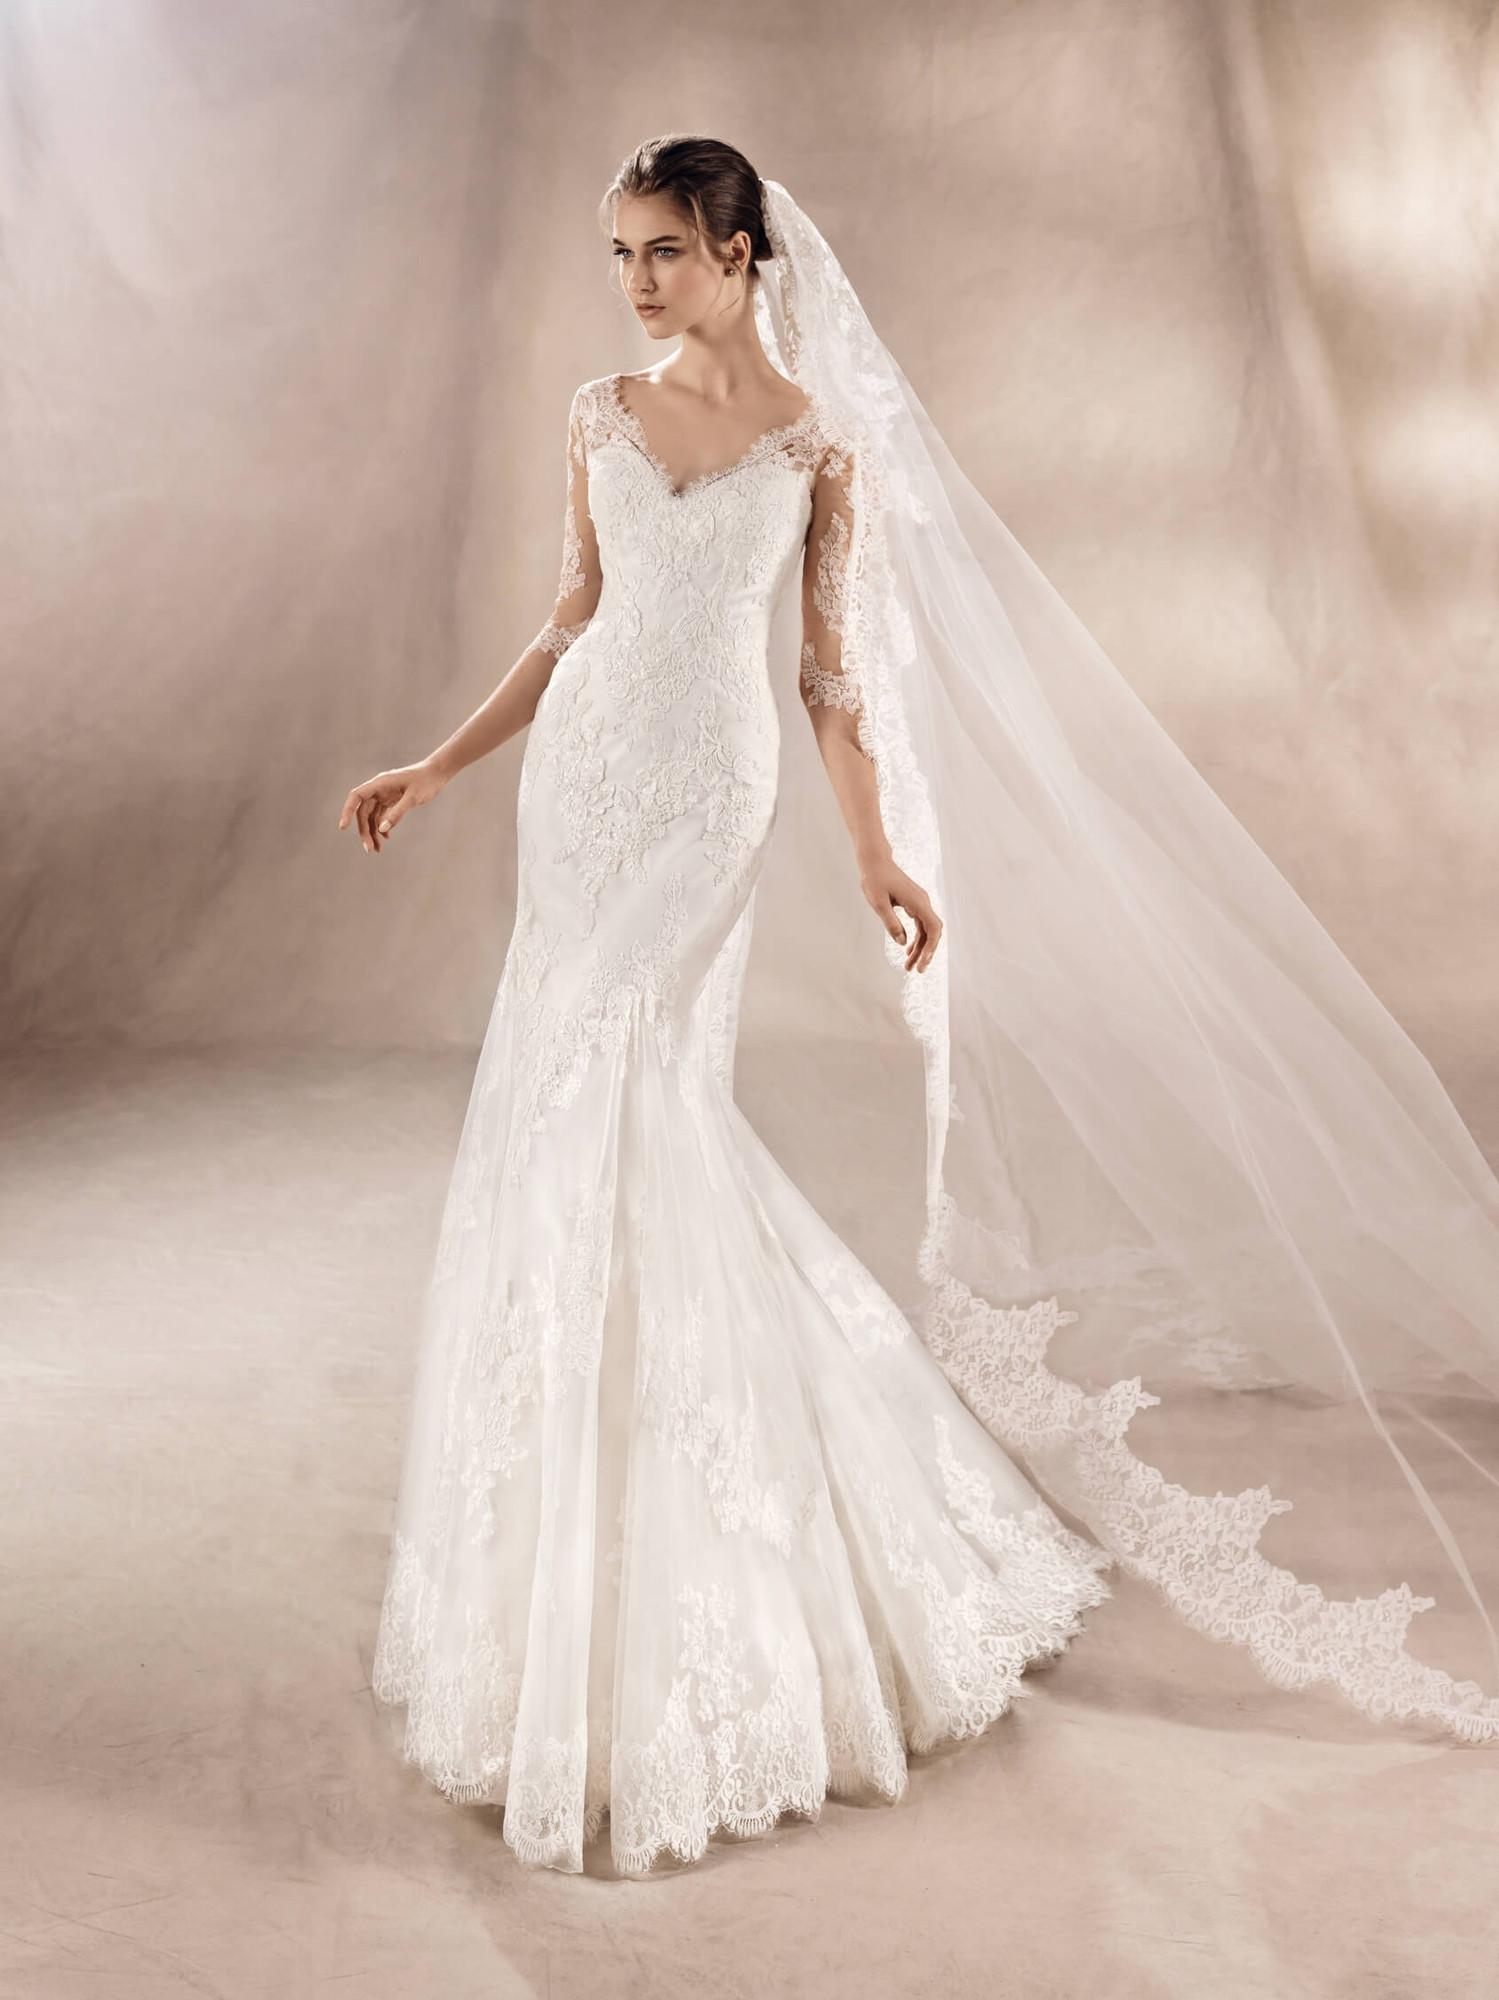 2536d290b4 Wedding Dresses Mermaid   Trumpet Silhouette - Page 37 - Weddingwire.ca